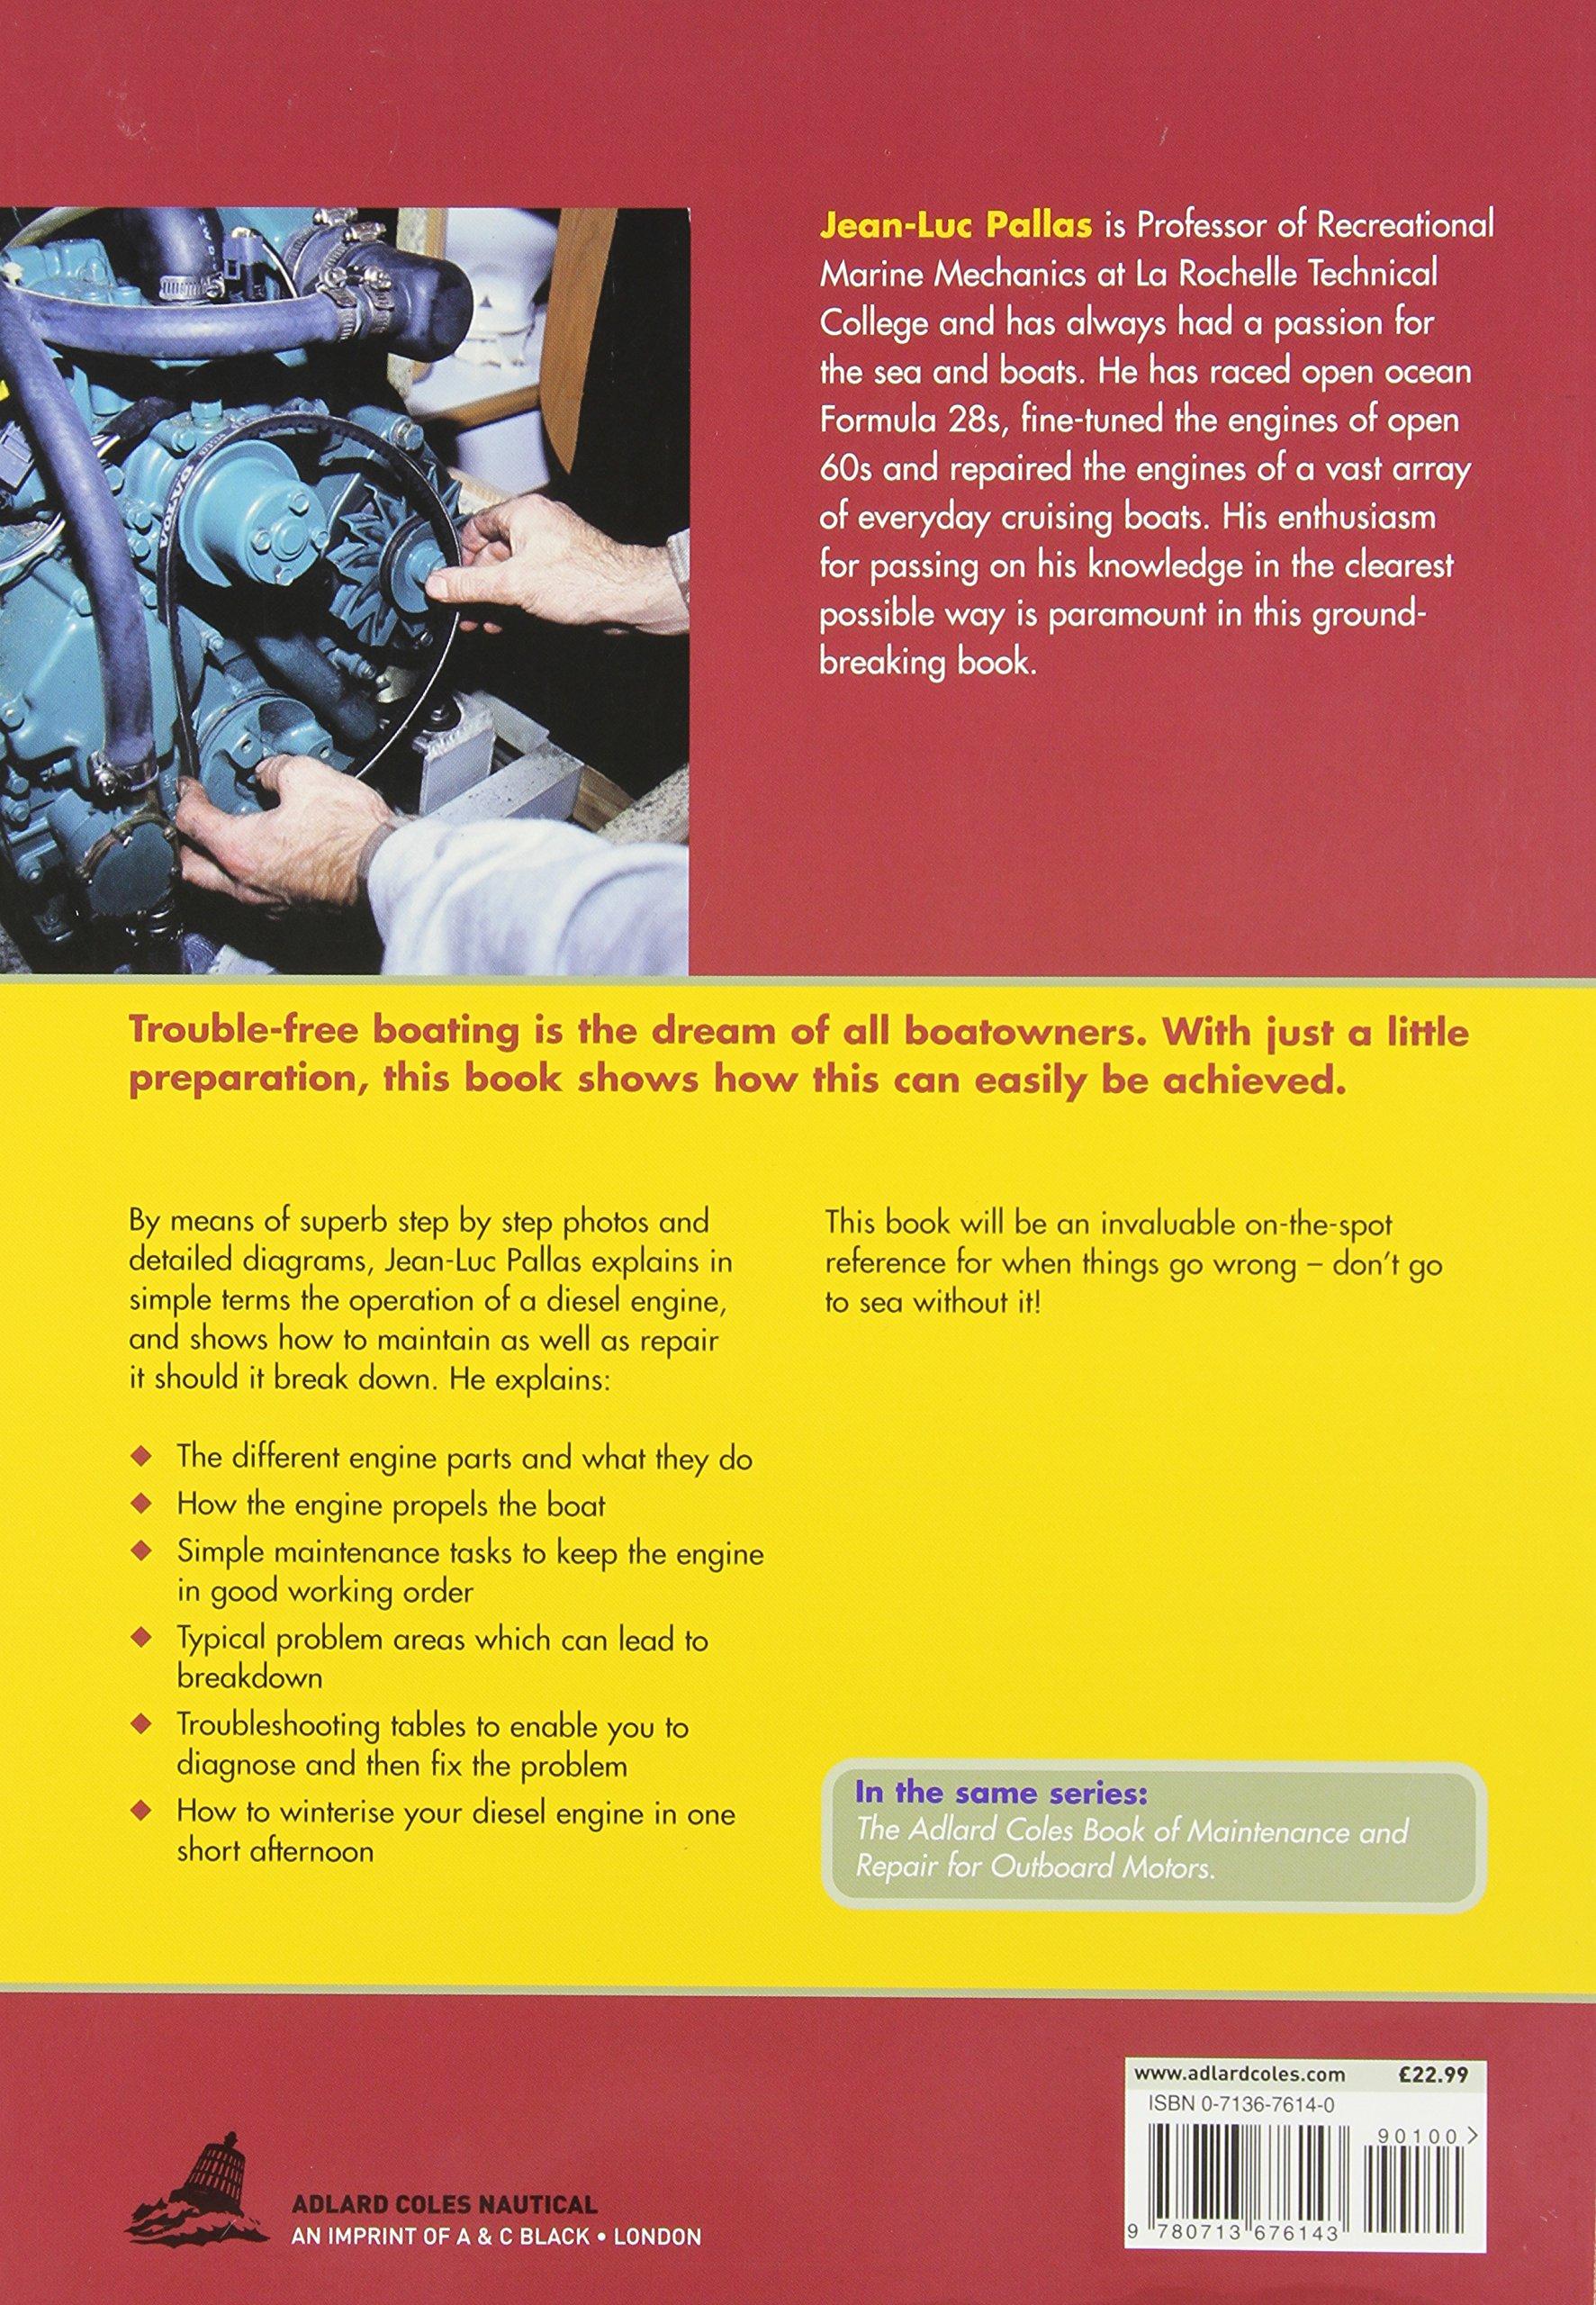 Maintenance and Repair Manual for Diesel Engines (Adlard Coles Book of):  Jean-Luc Pallas: 9780713676143: Amazon.com: Books